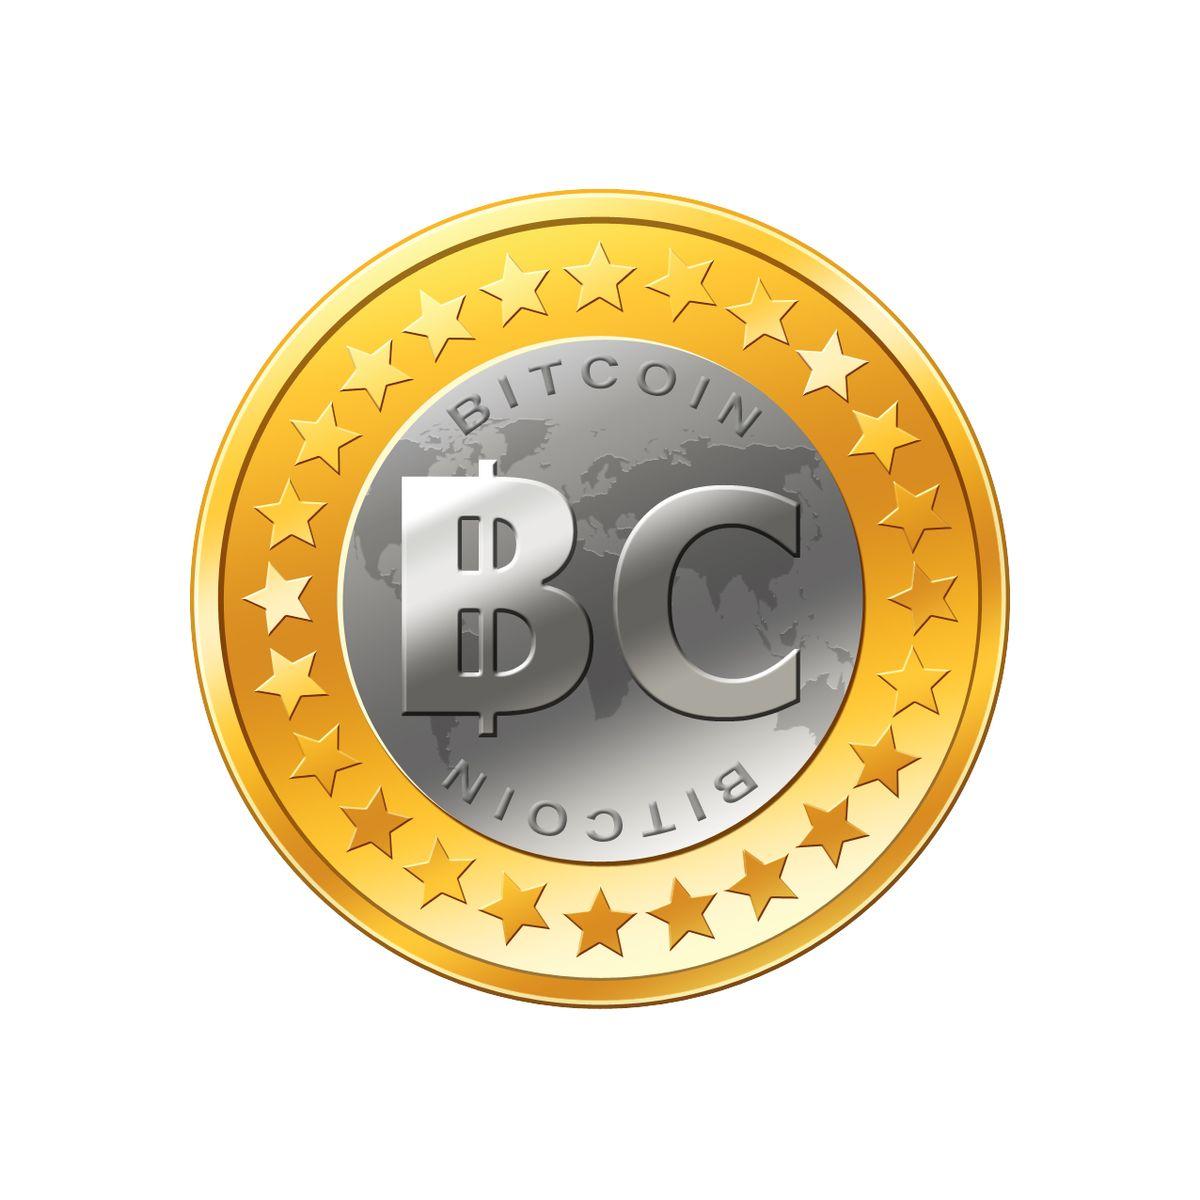 Bundesverband digitale wirtschaft bitcoins ron jeremy bets on who cums first movie